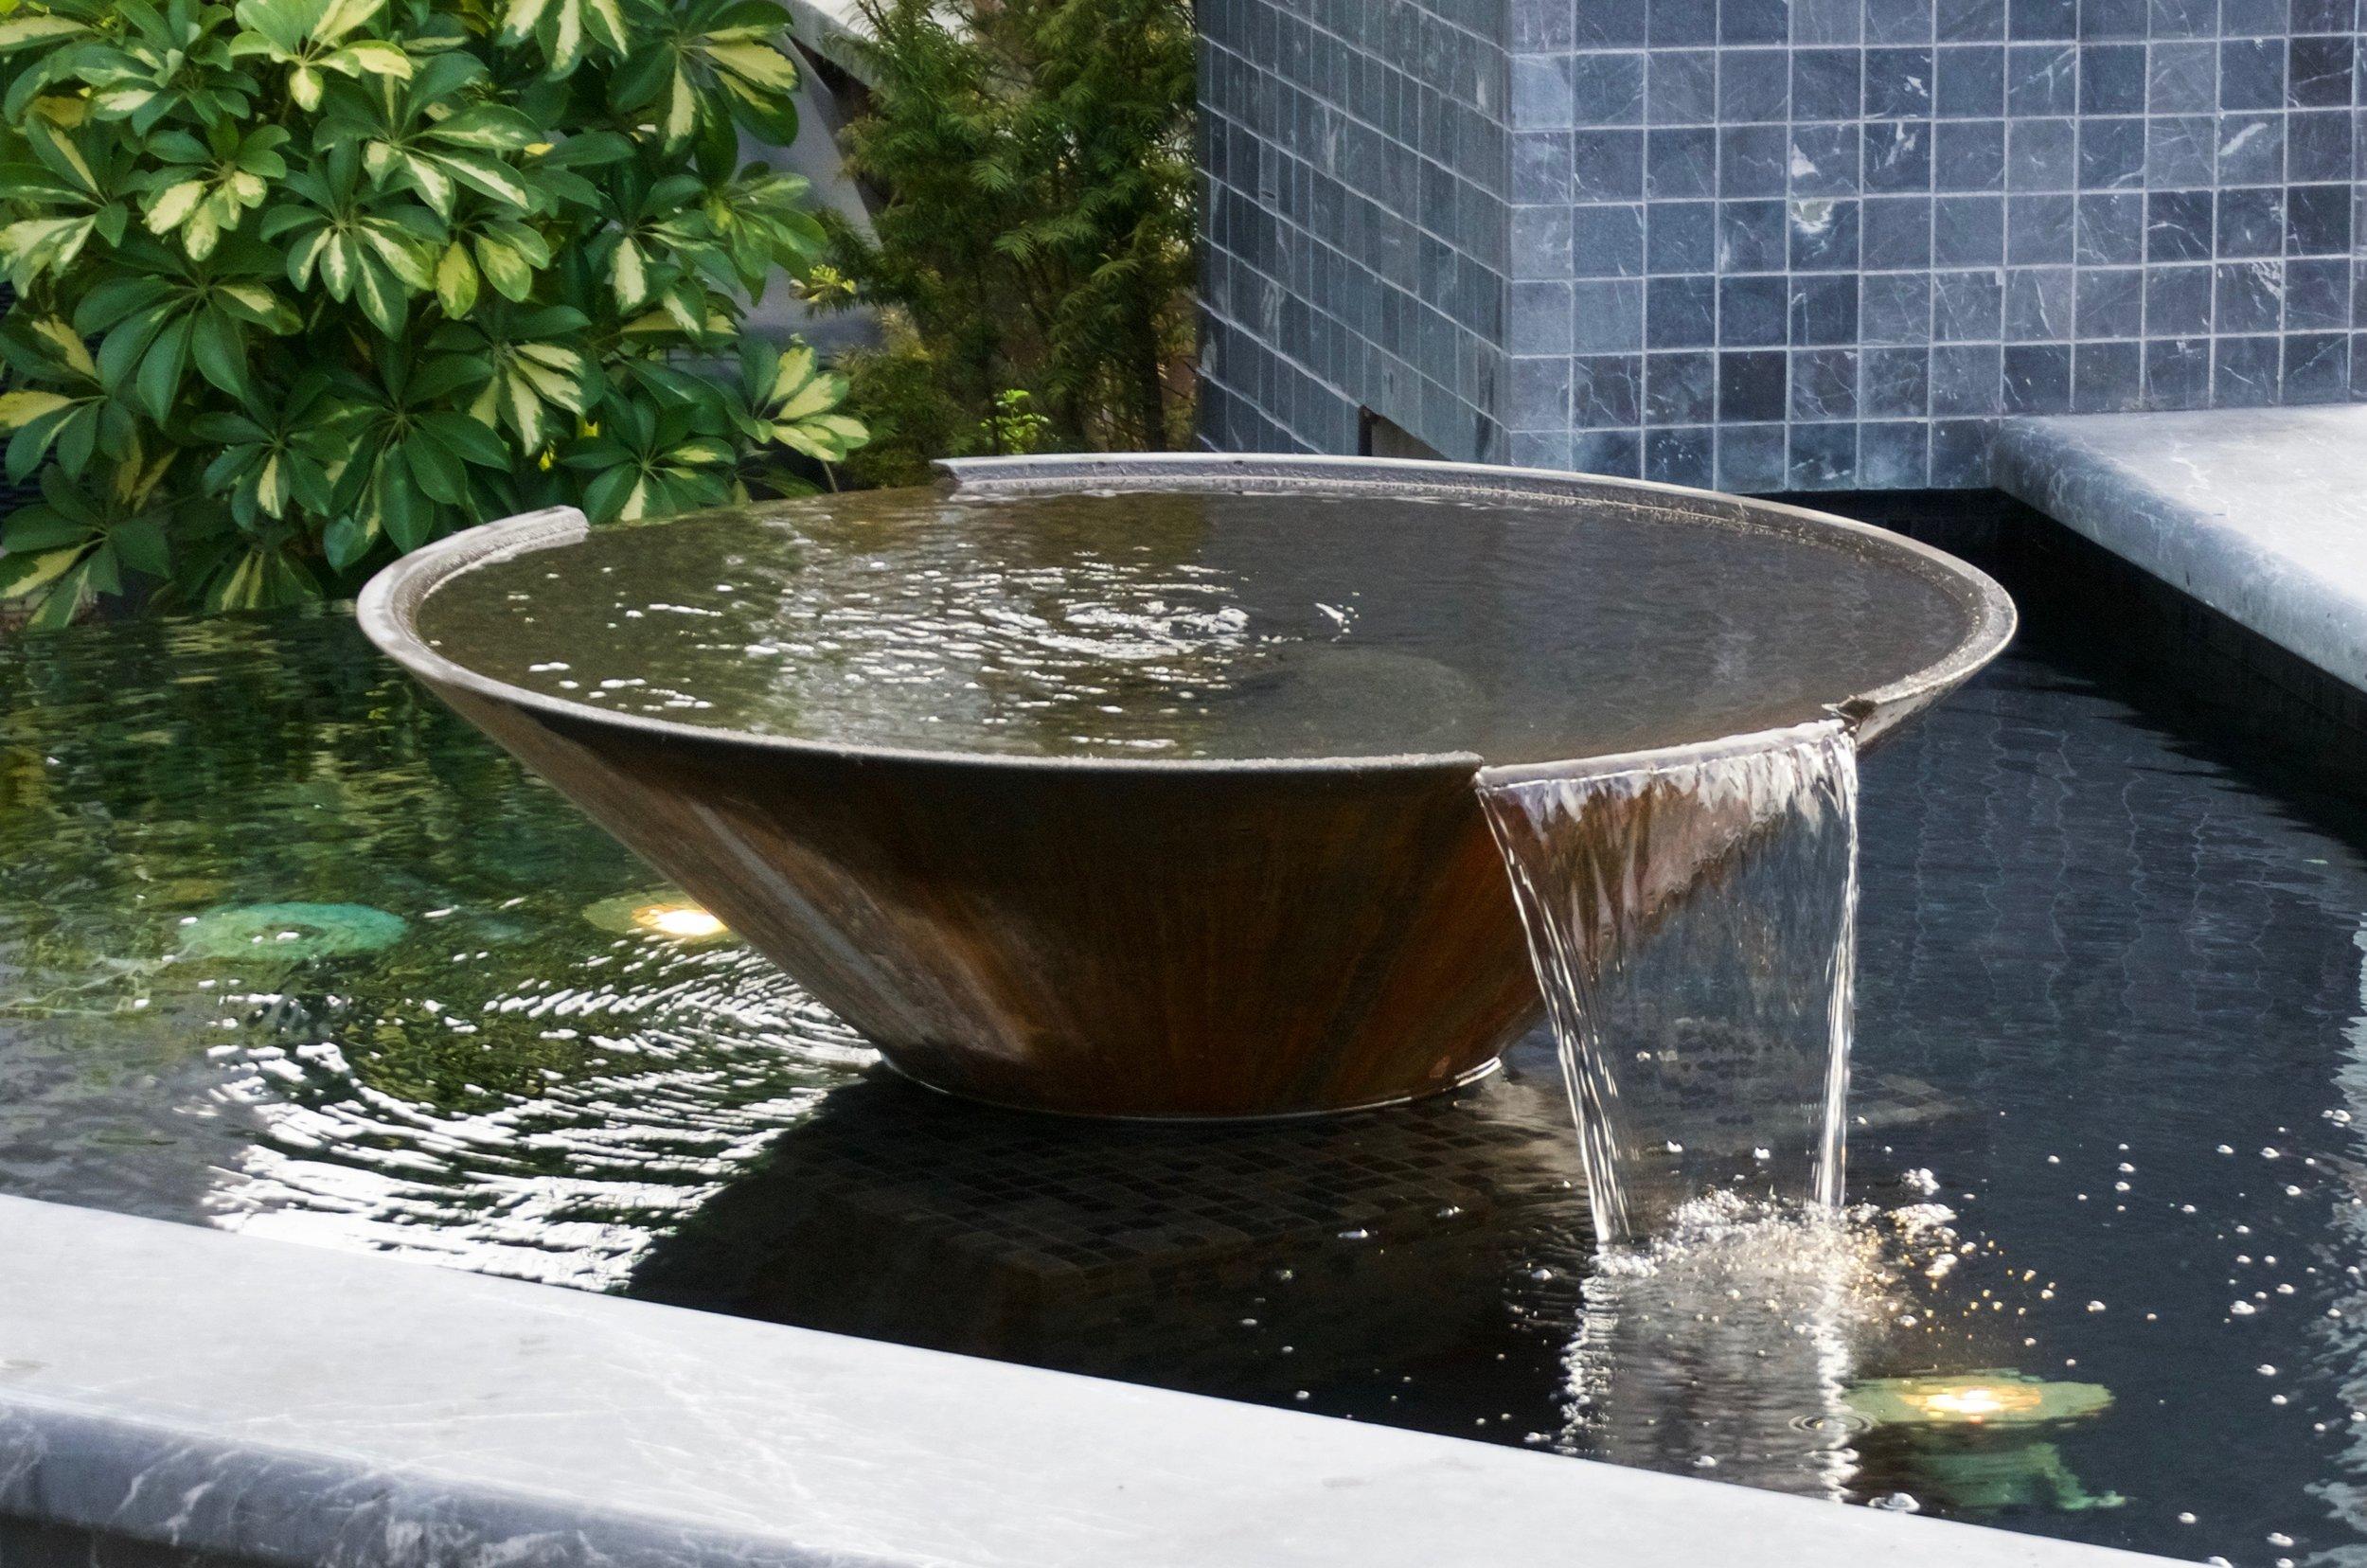 WATERBOWL AND REFLECTING POOL